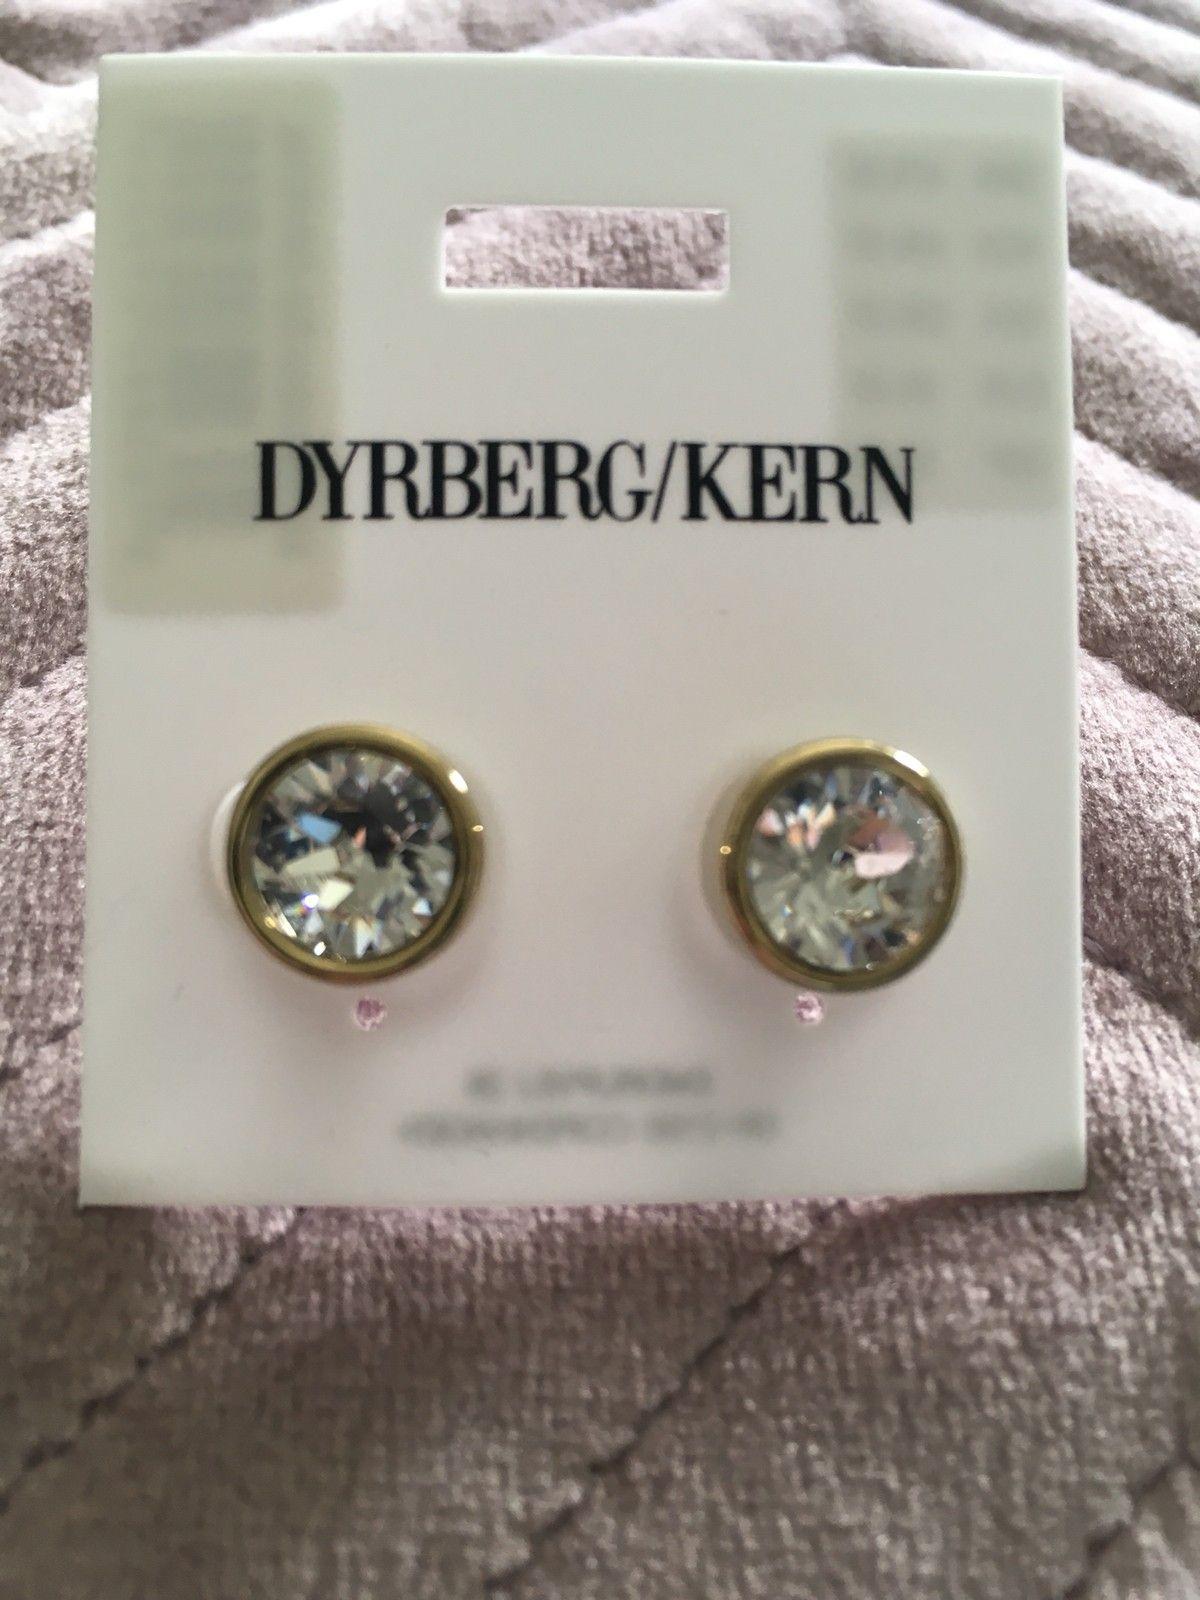 78b8f05e Dyrberg/Kern øredobber | FINN.no